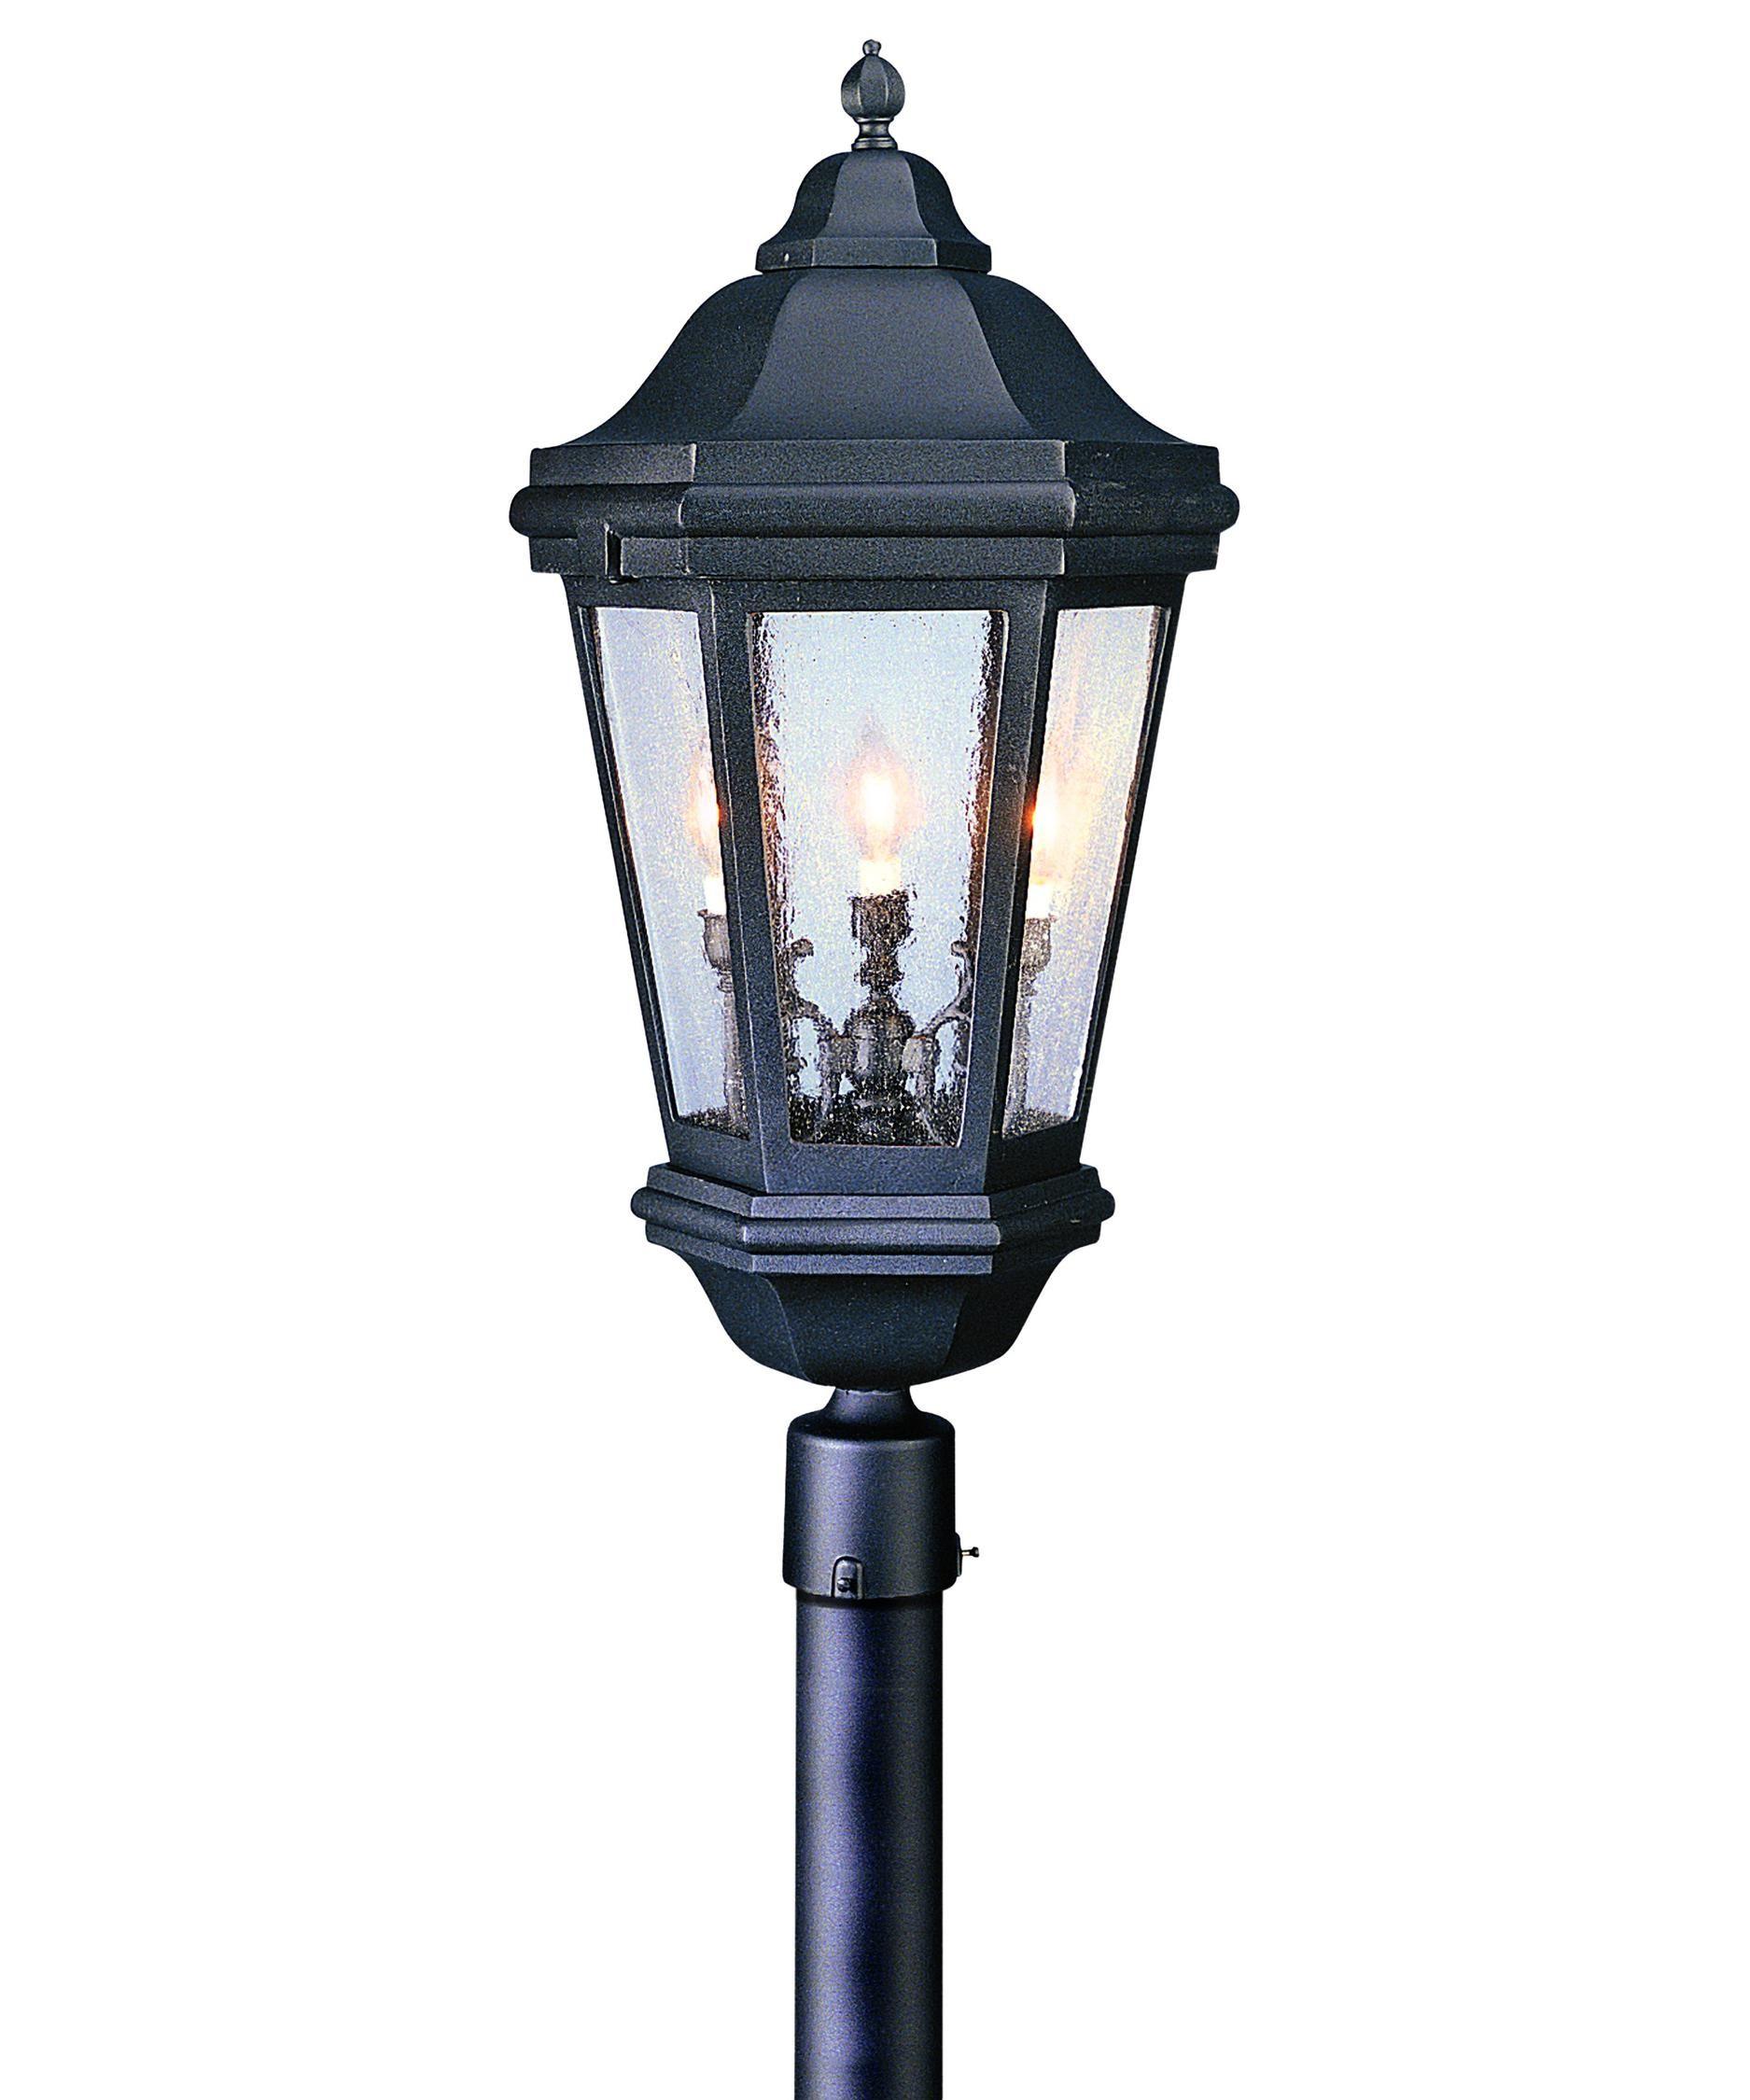 Verona 34 Inch Tall 3 Light Outdoor Post Lamp Capitol Lighting Troy Lighting Post Lights Outdoor Post Lights